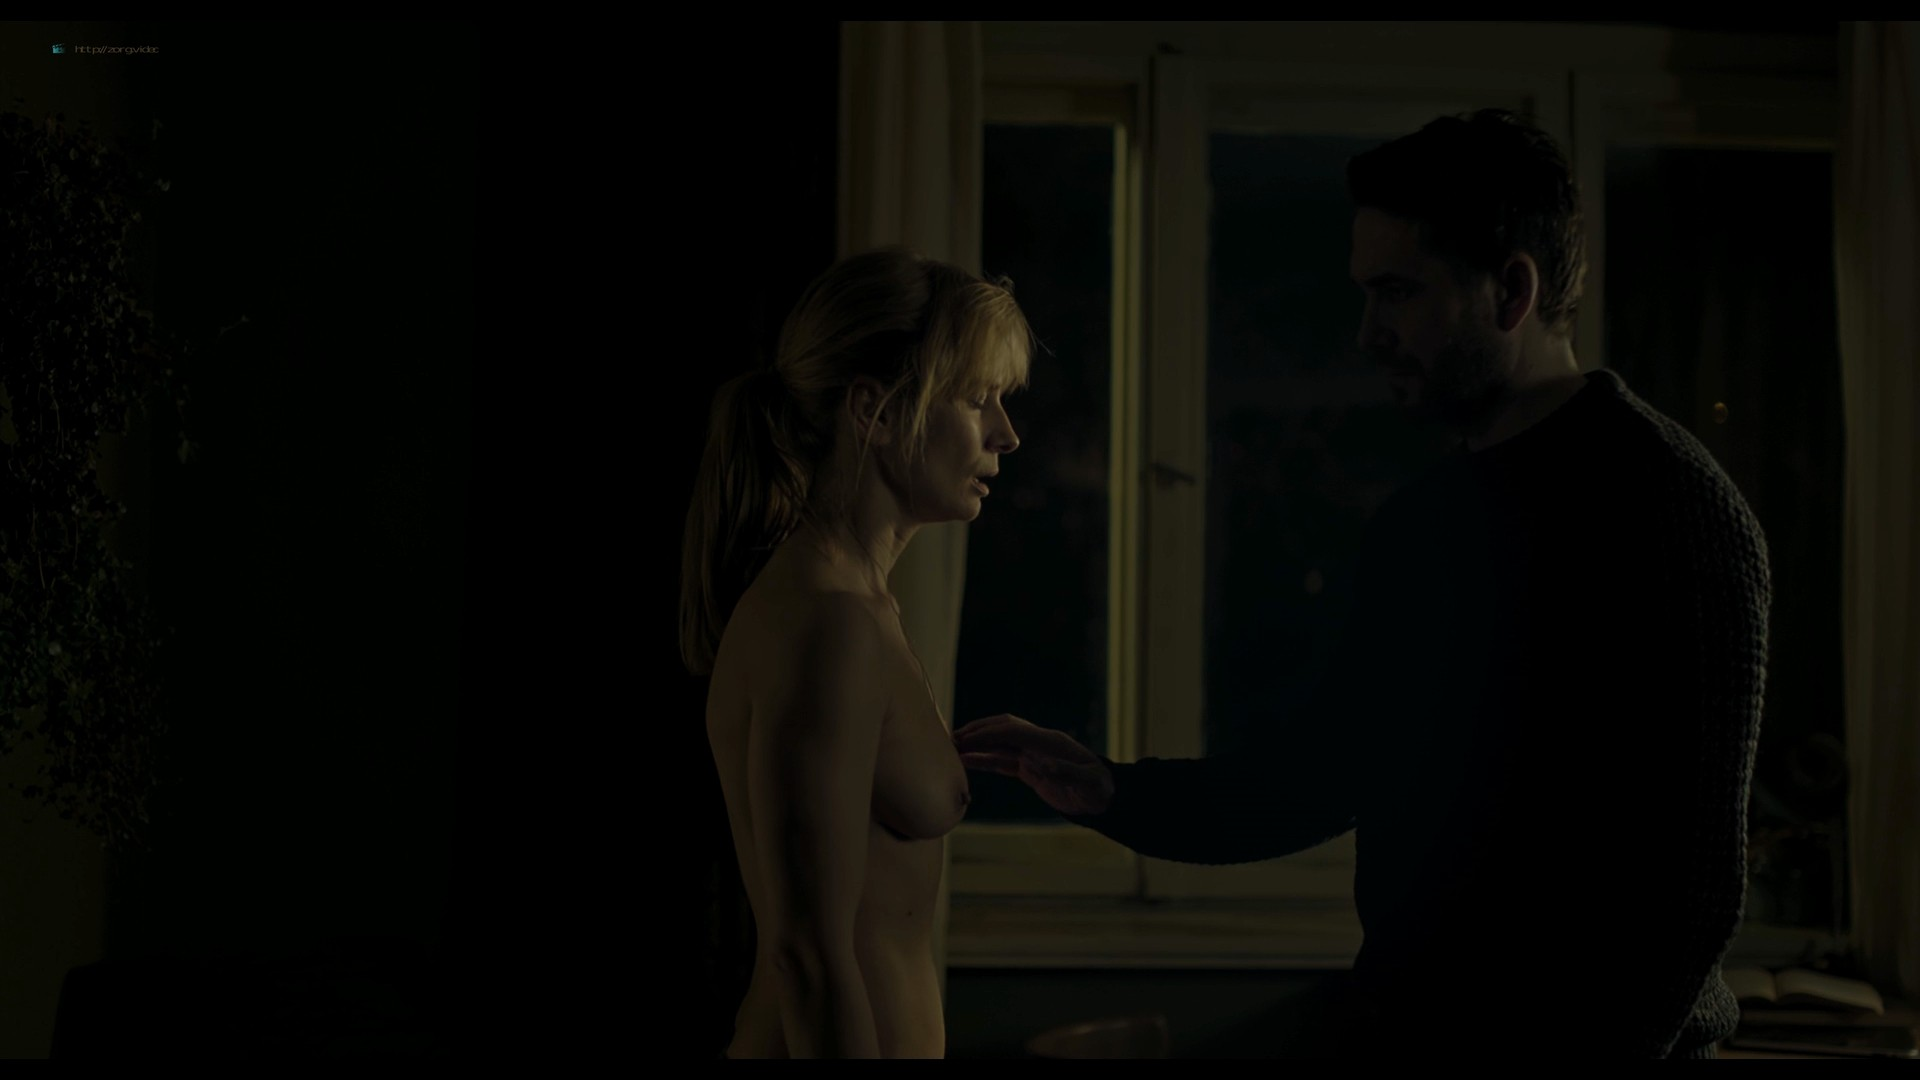 Magdalena Cielecka nude sex Roma Gasiorowska nude too - Dark, Almost Night (PL-2019) HD 1080p BluRay (7)